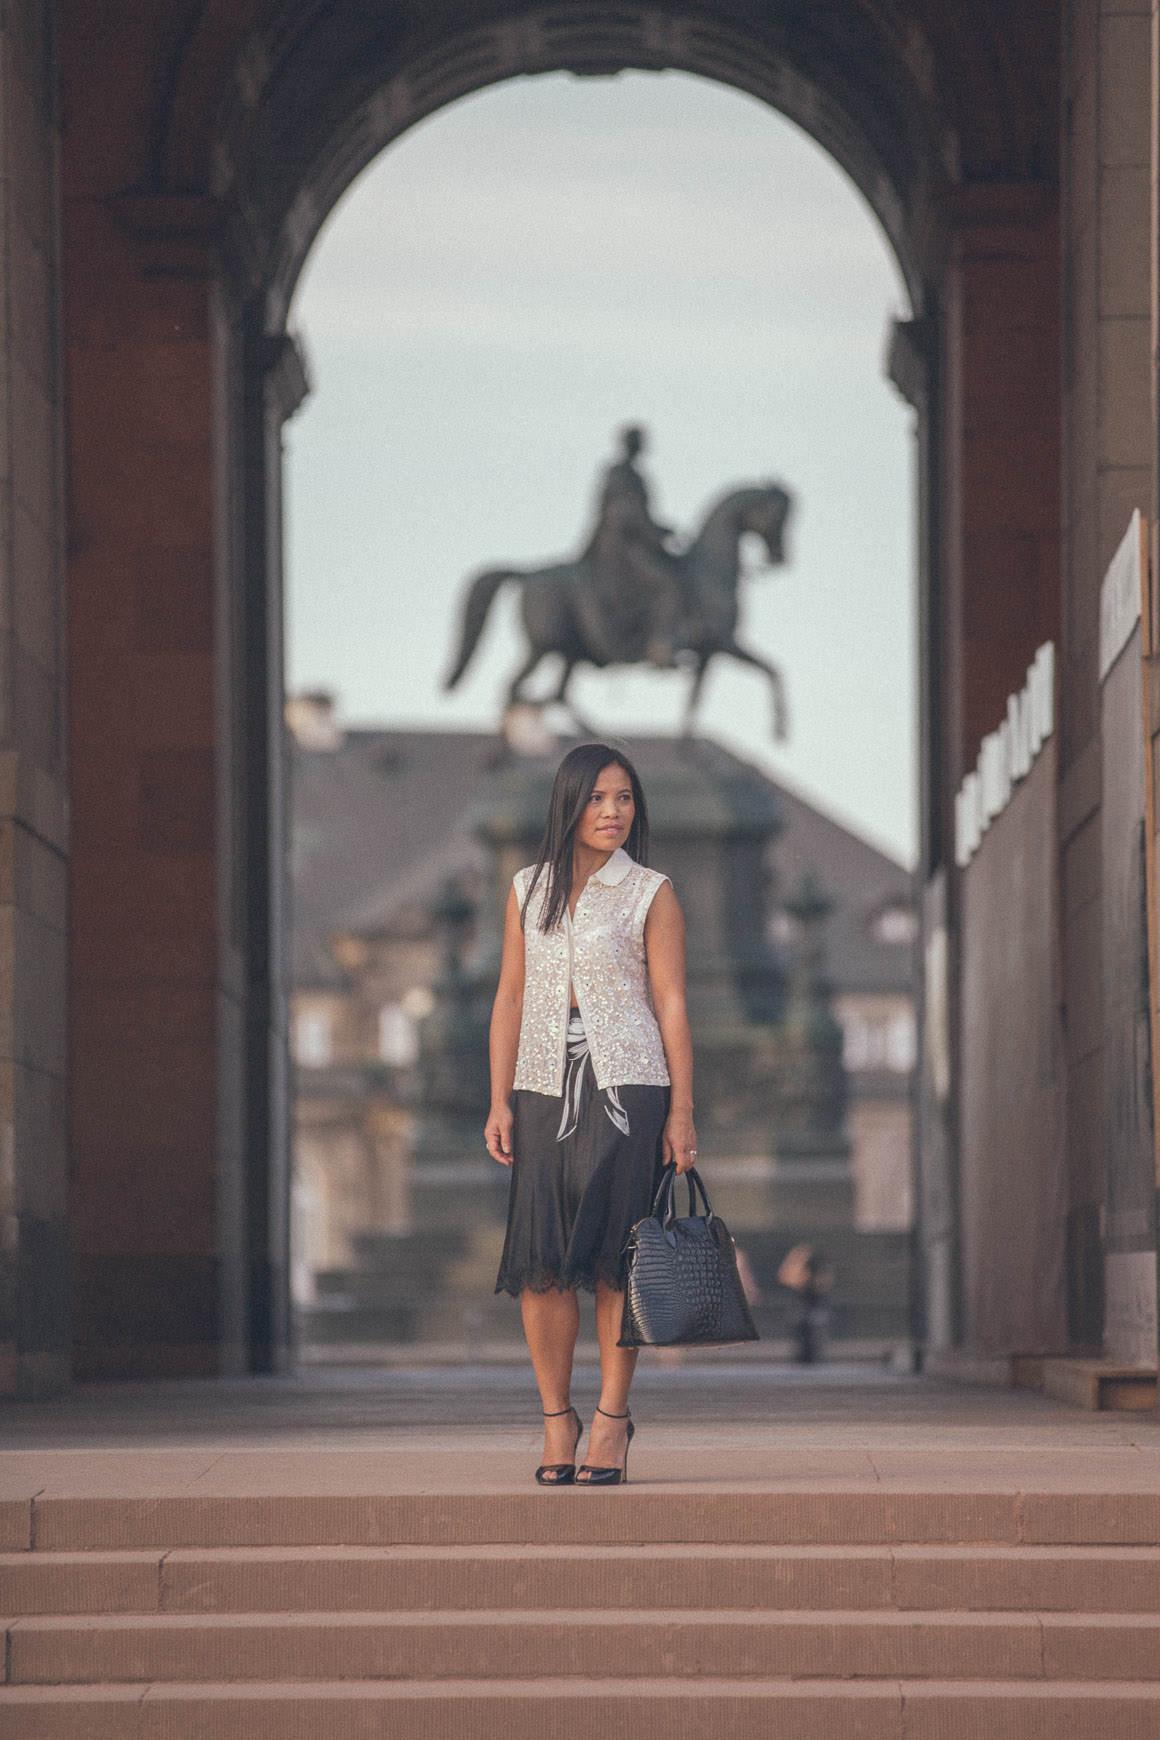 zwinger dresden - melbourne fashion blogger travels